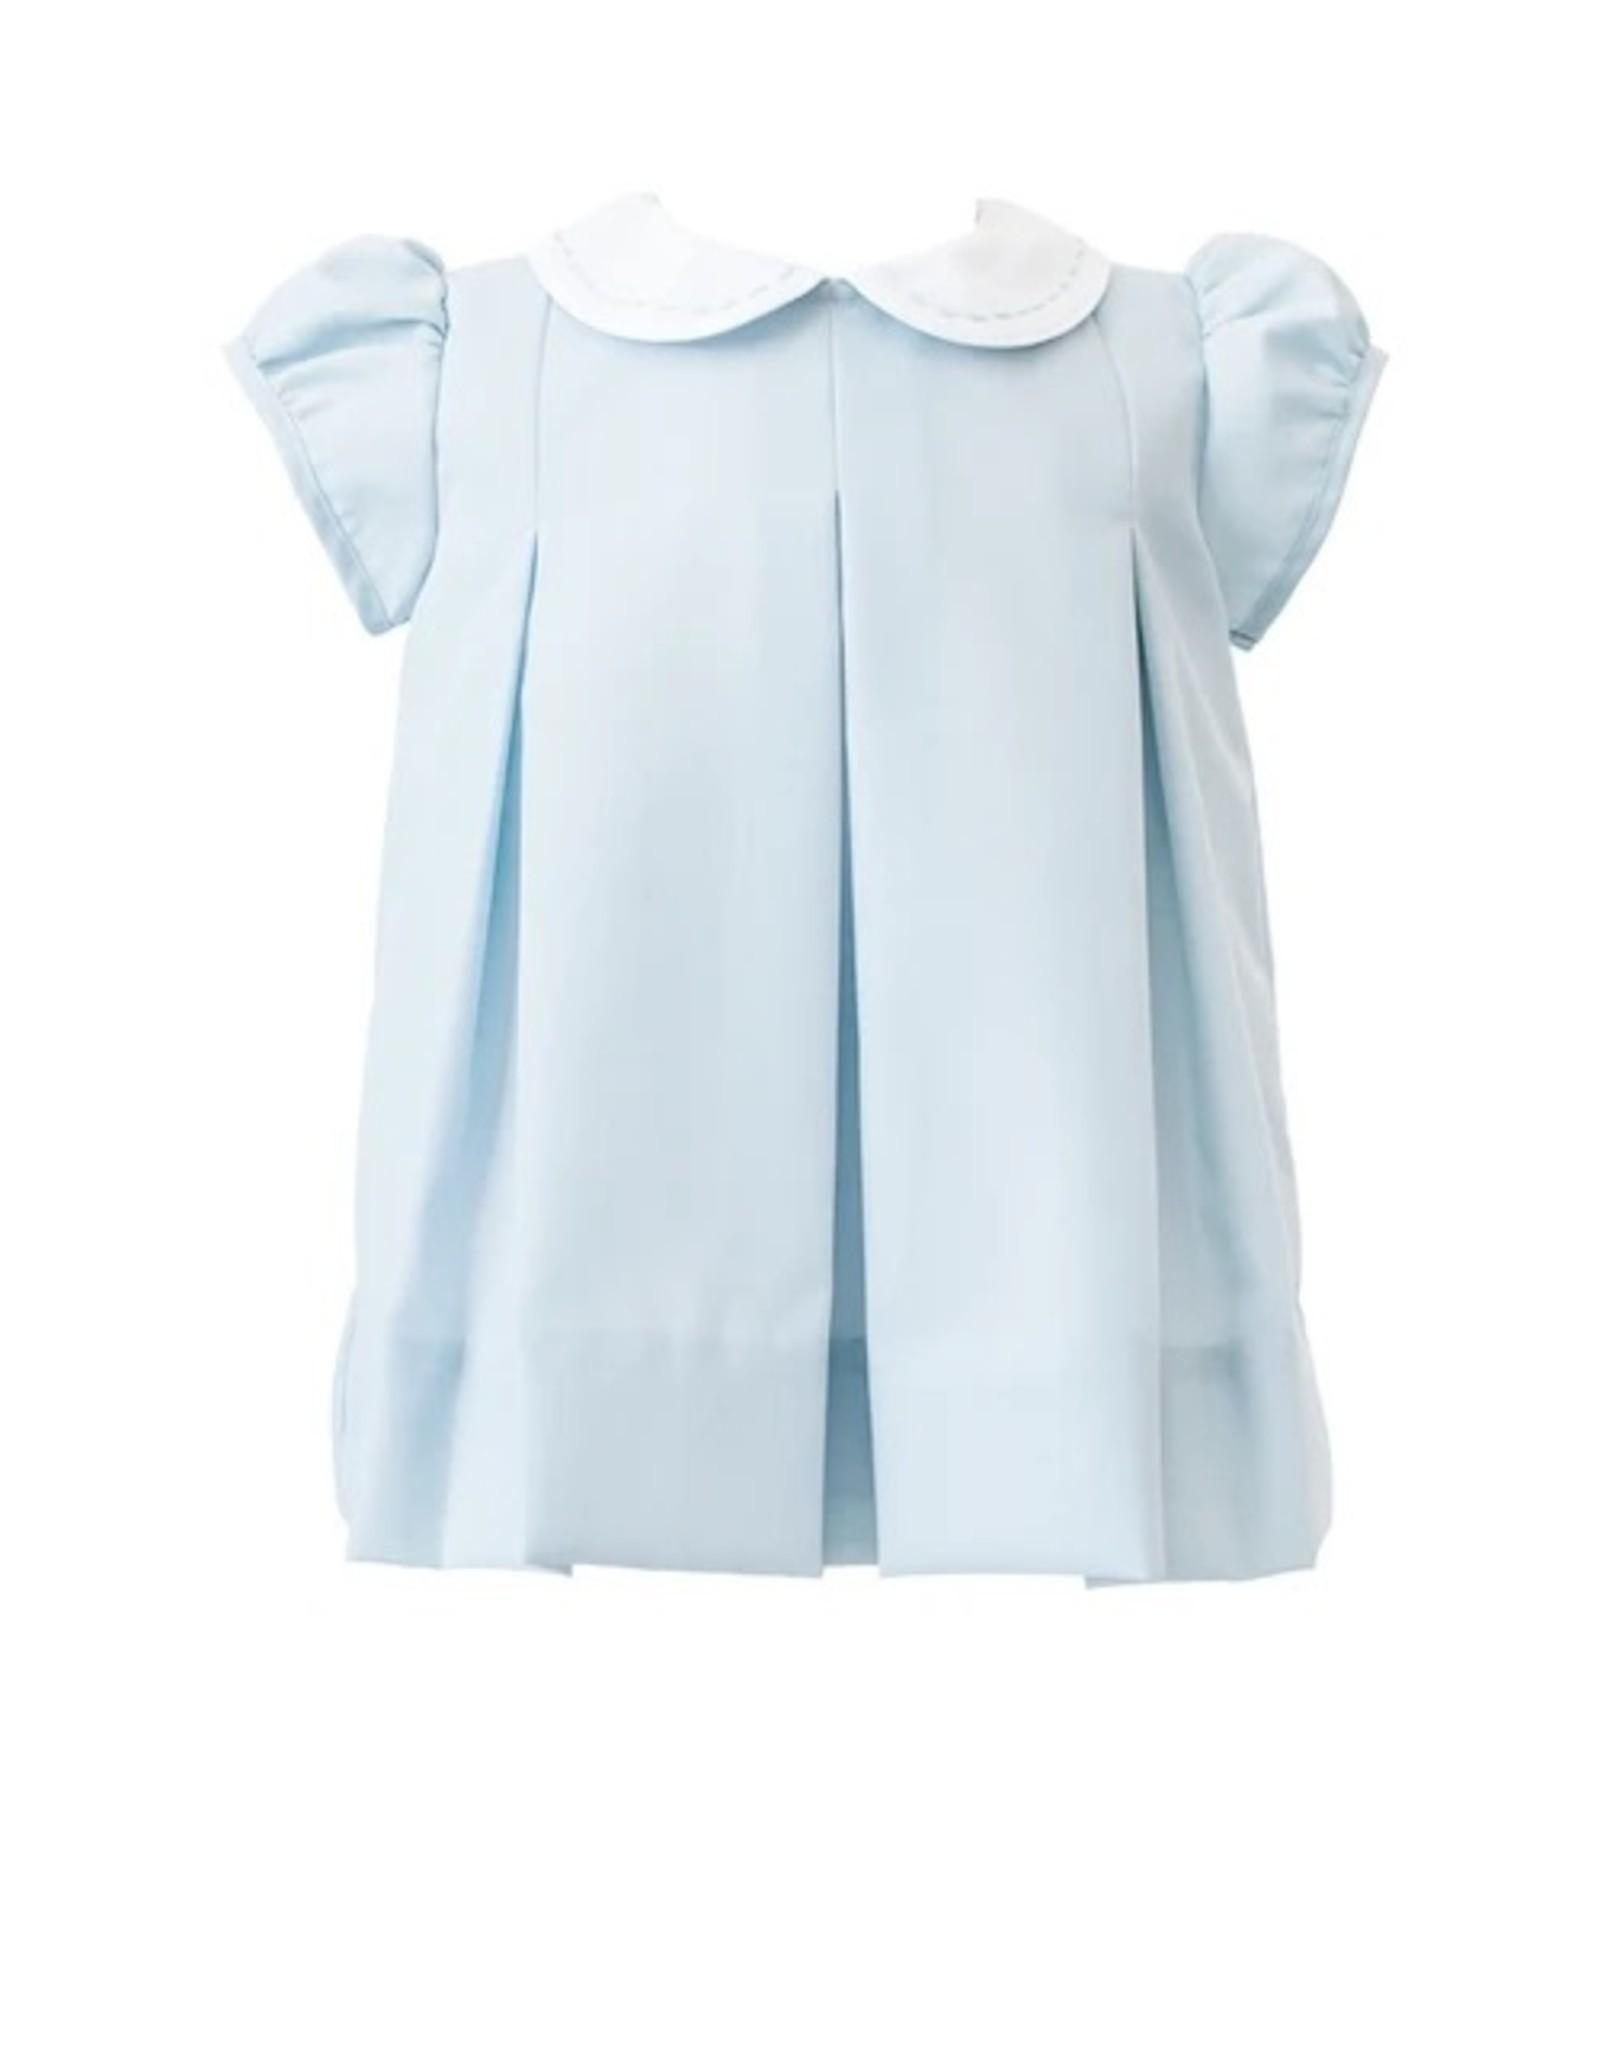 The Proper Peony Classic Pleat Dress